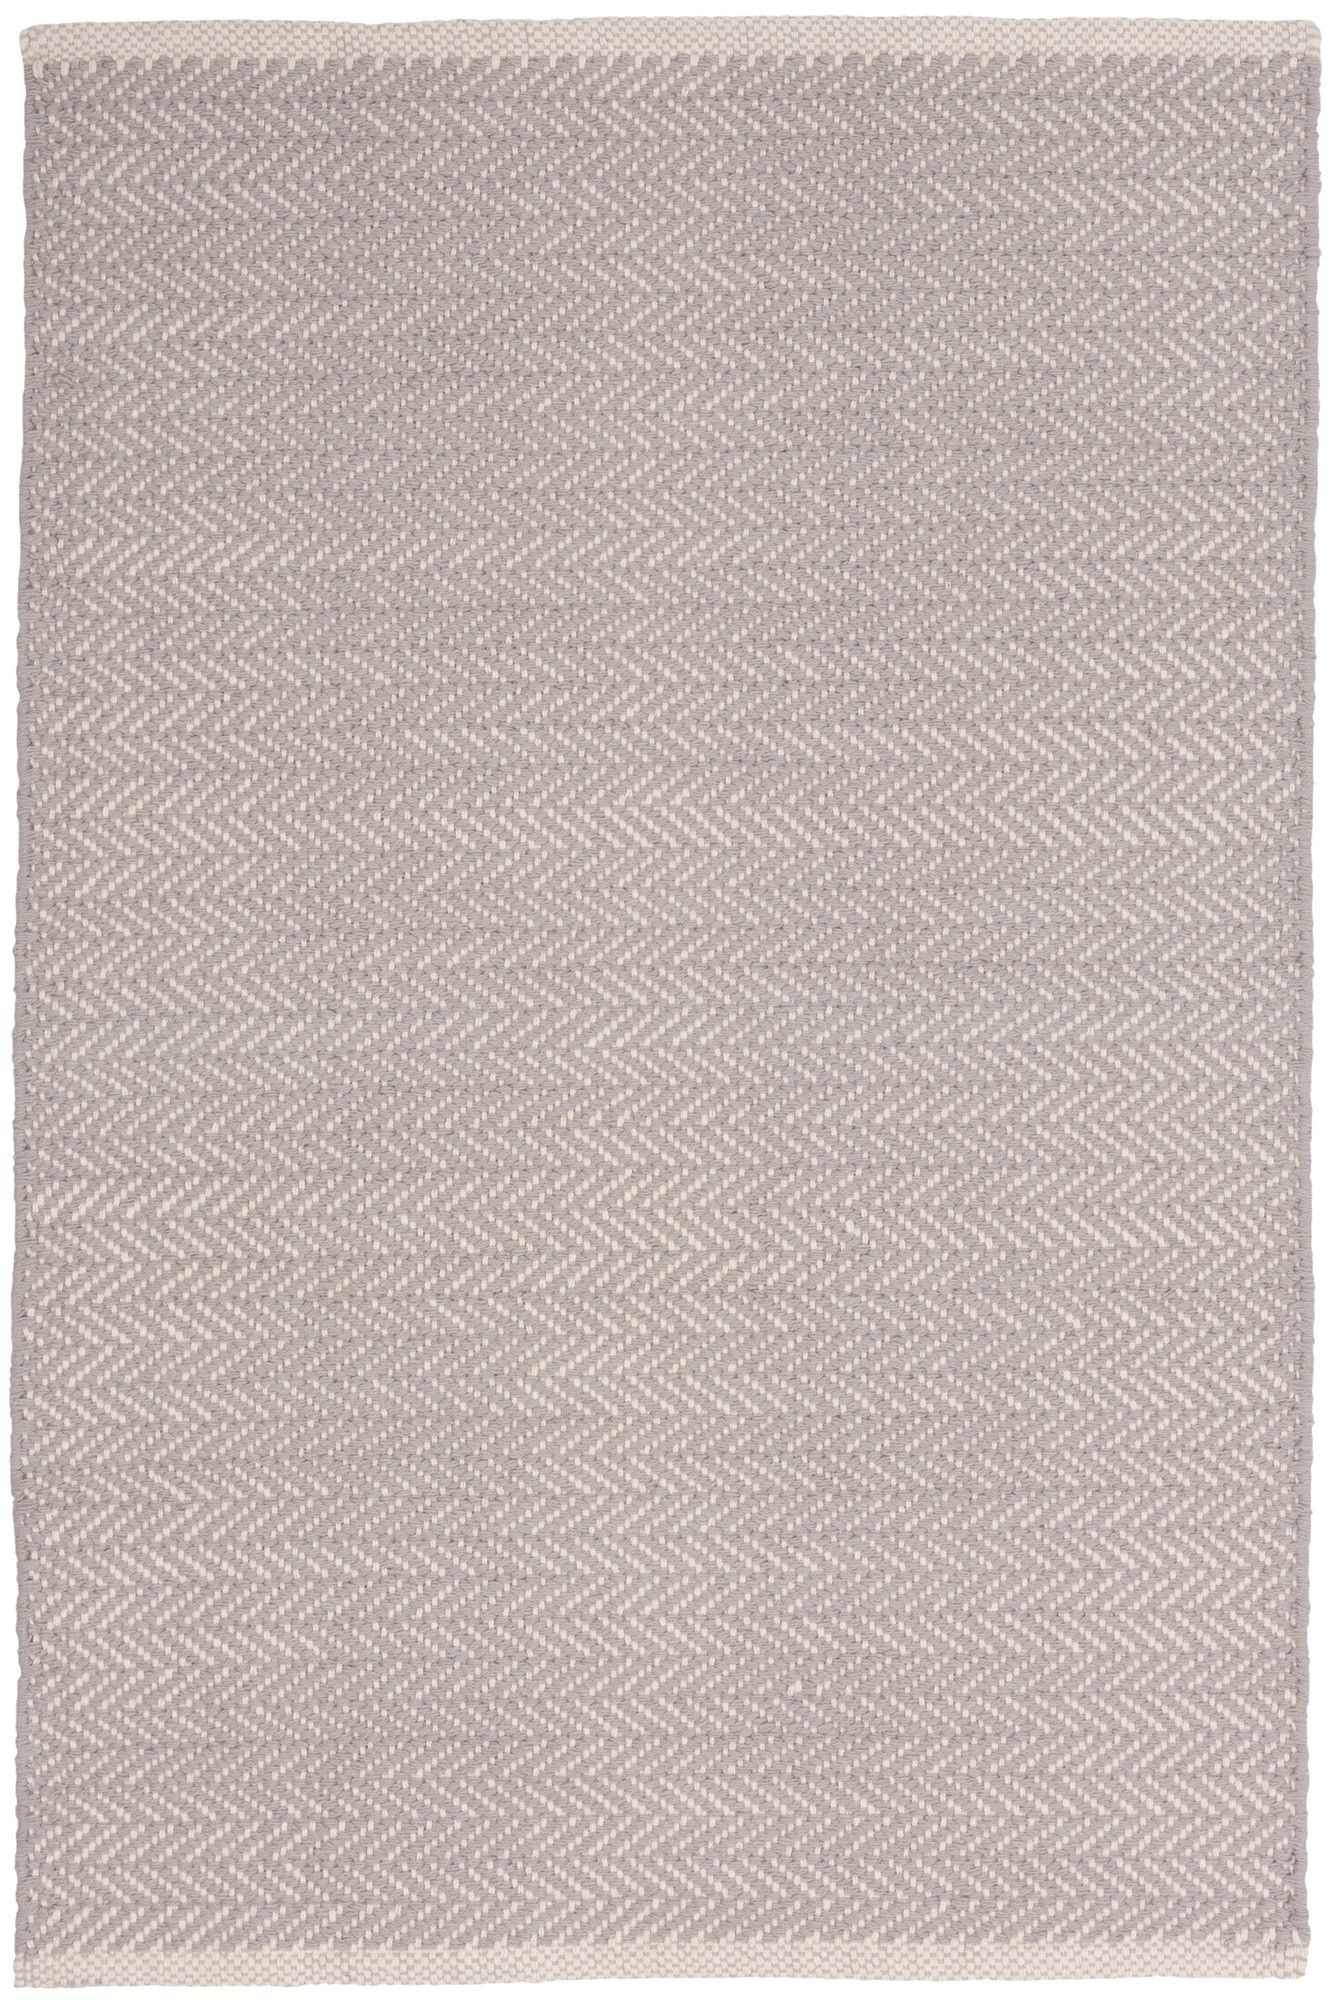 Dash And Albert Rugs Herringbone Woven Cotton Dove Grey Area Rug Reviews Wayfair